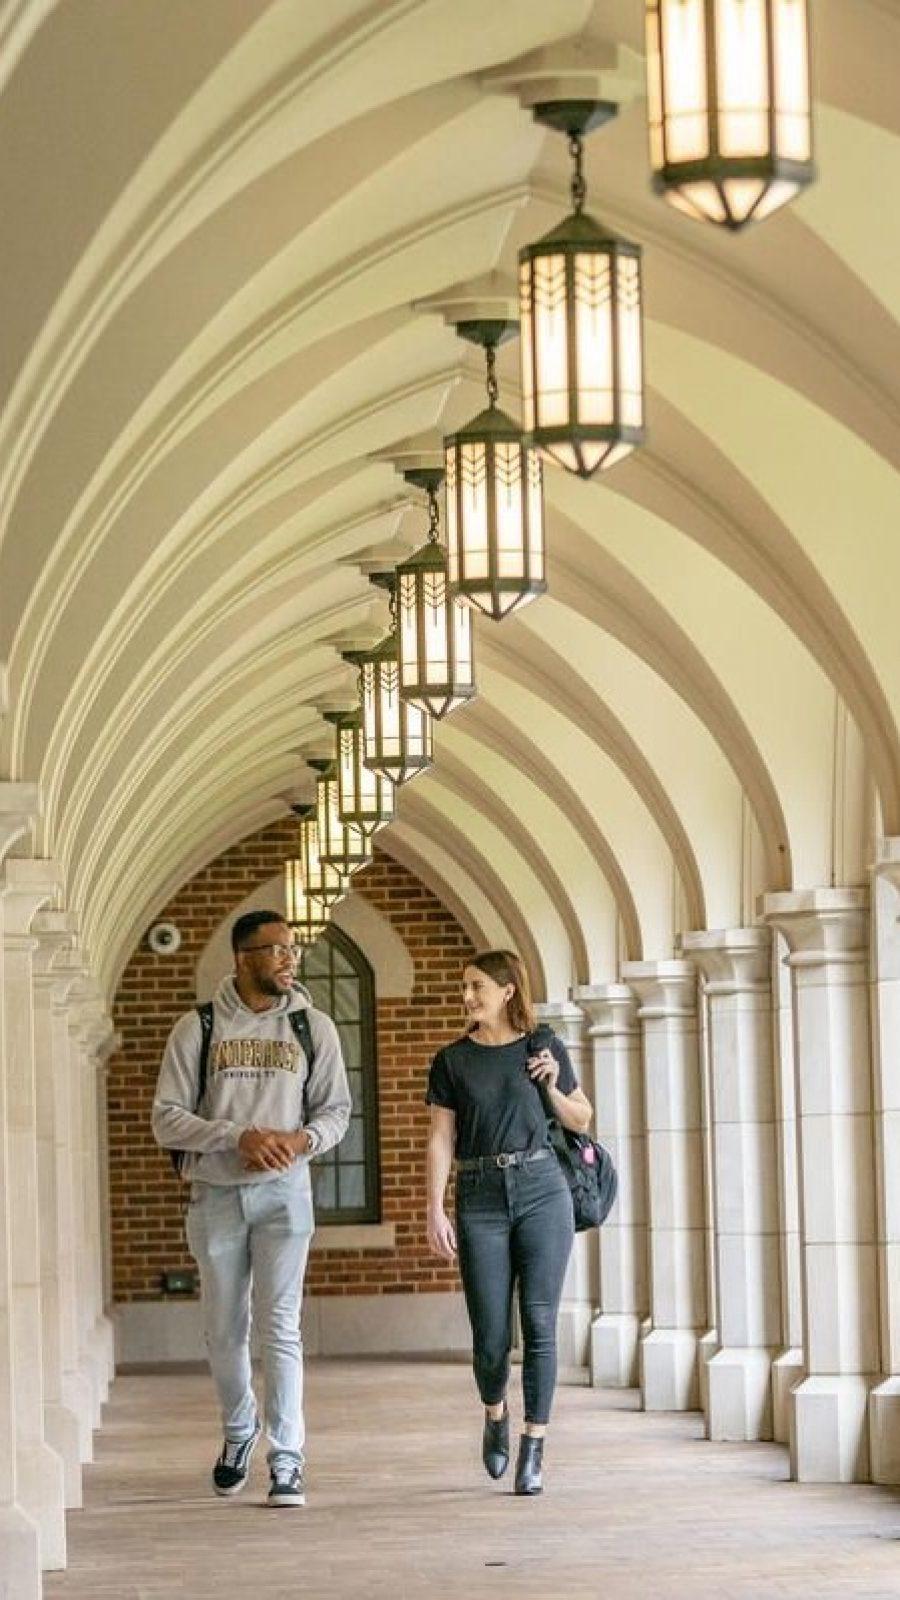 Students walking through campus.